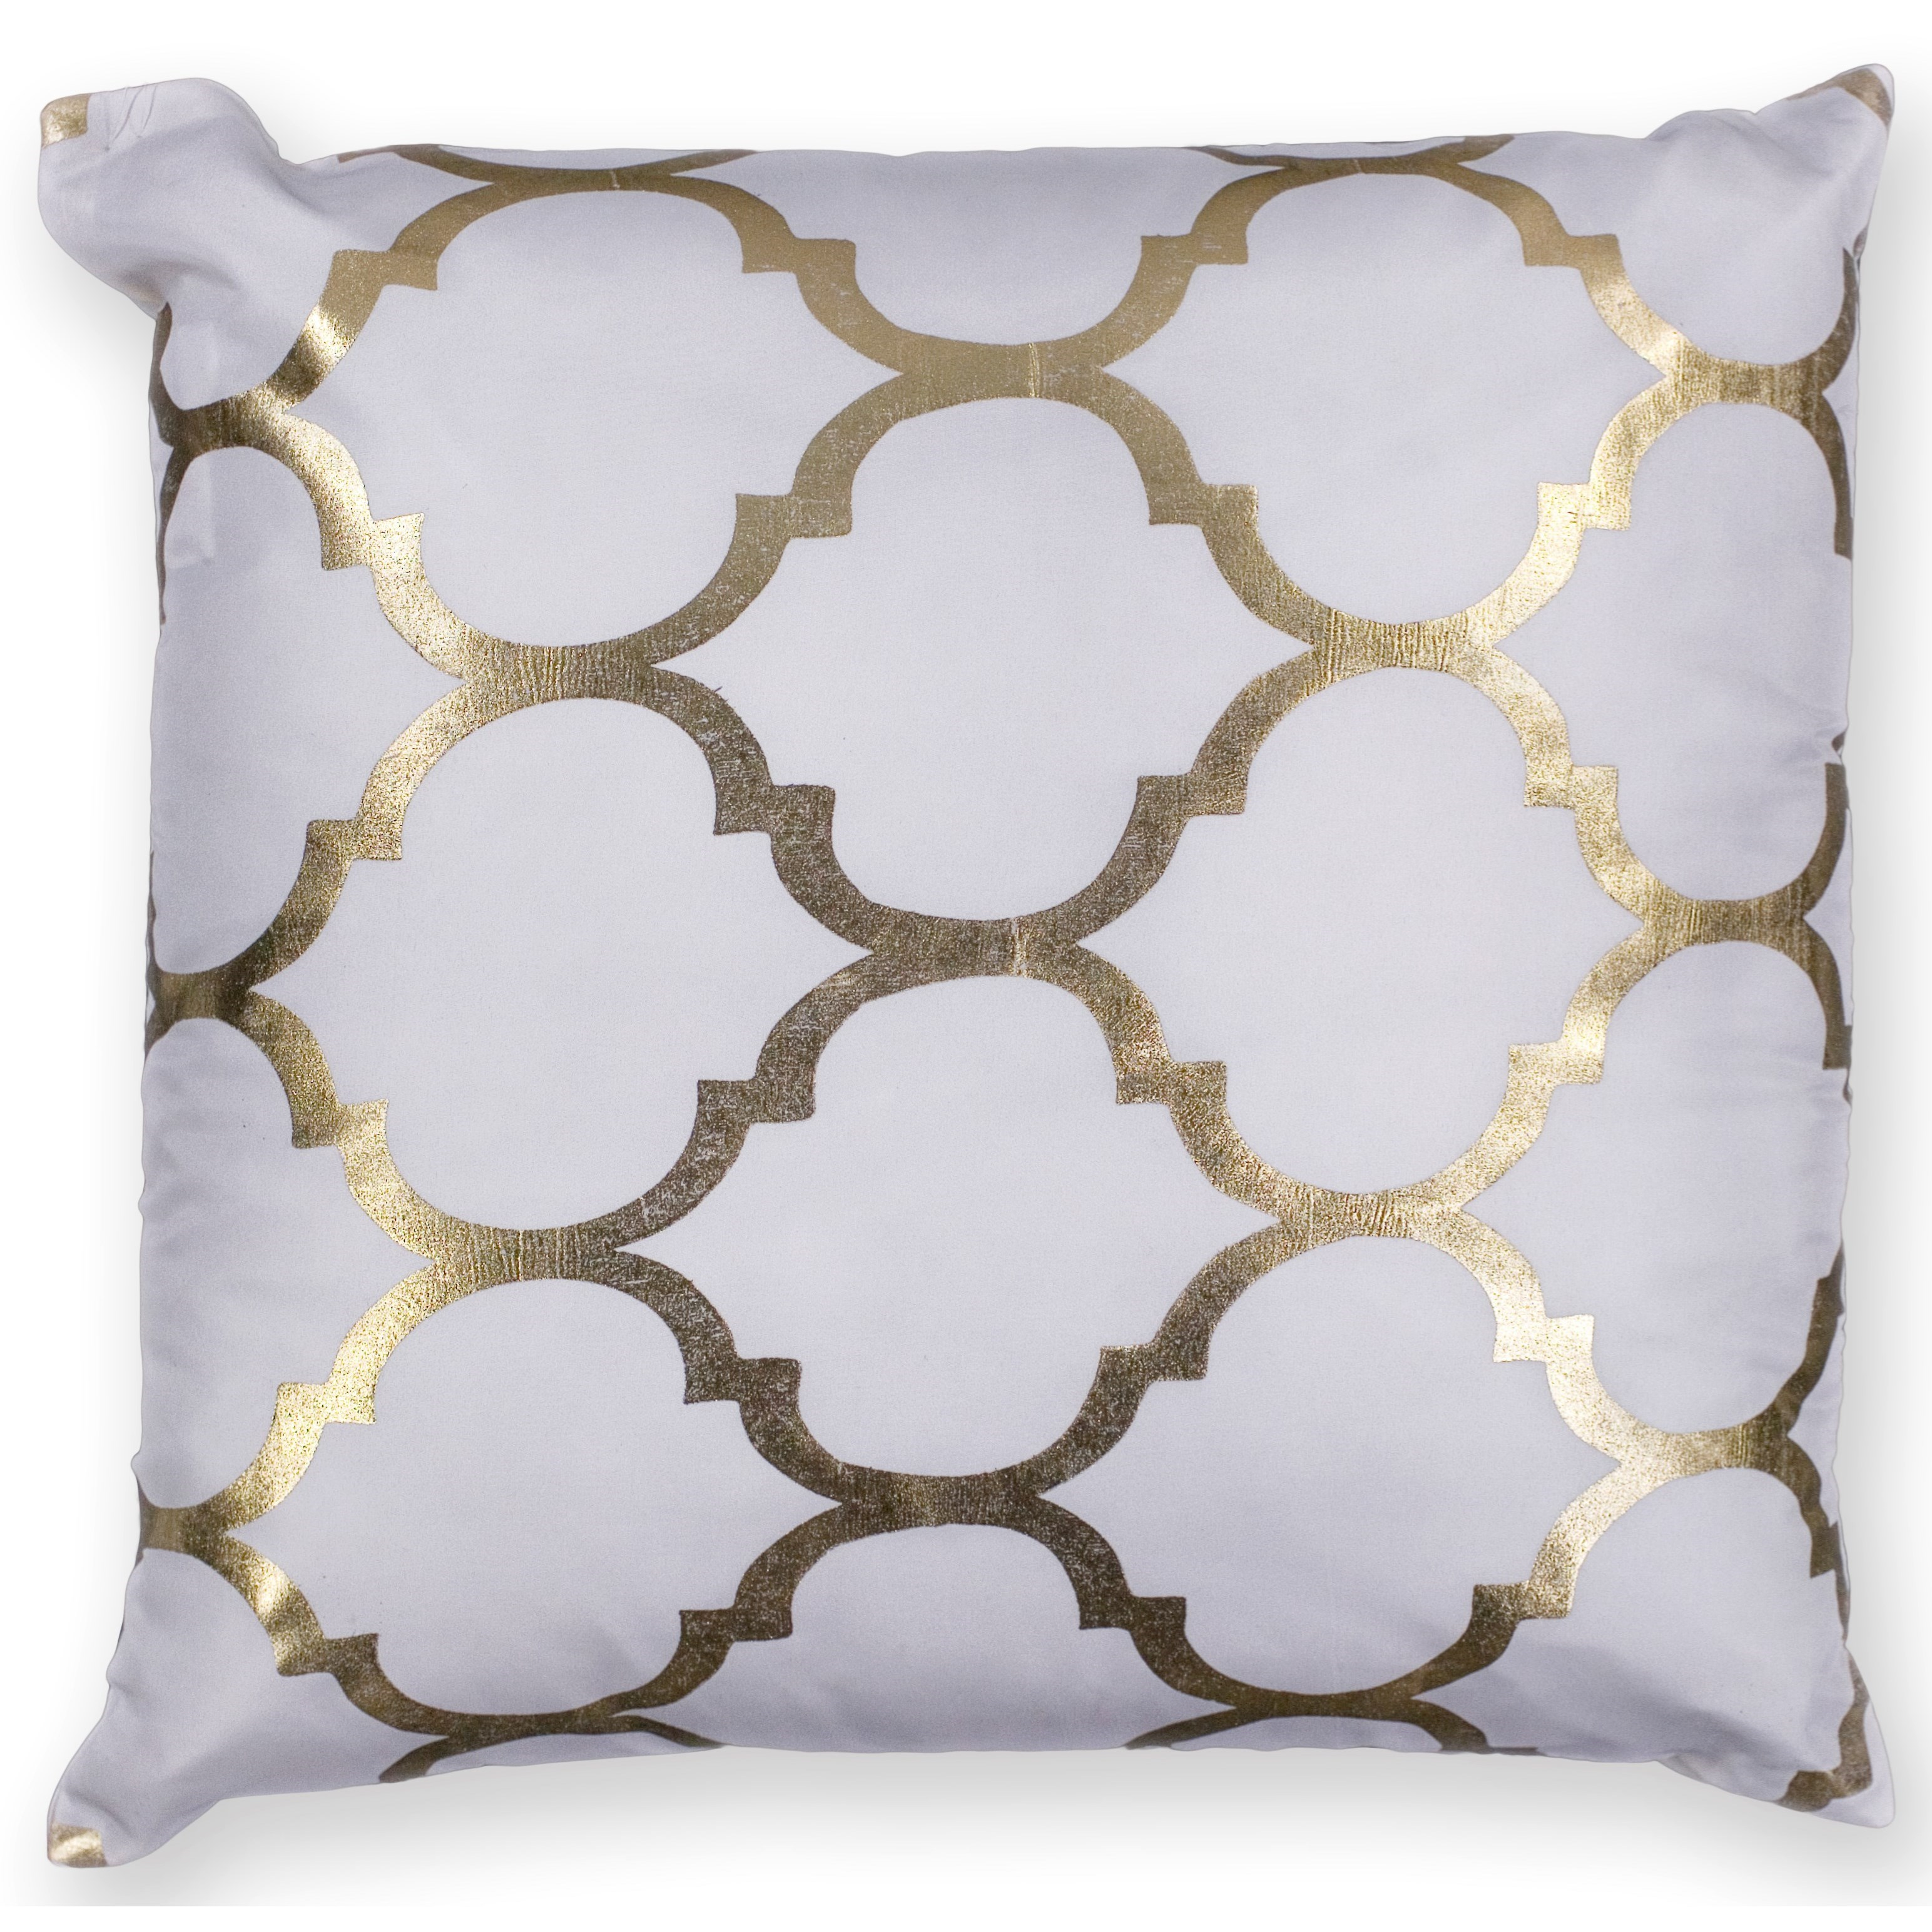 "Pillow 18"" X 18"" Ivory Trellis Pillows by Kas at Zak's Home"